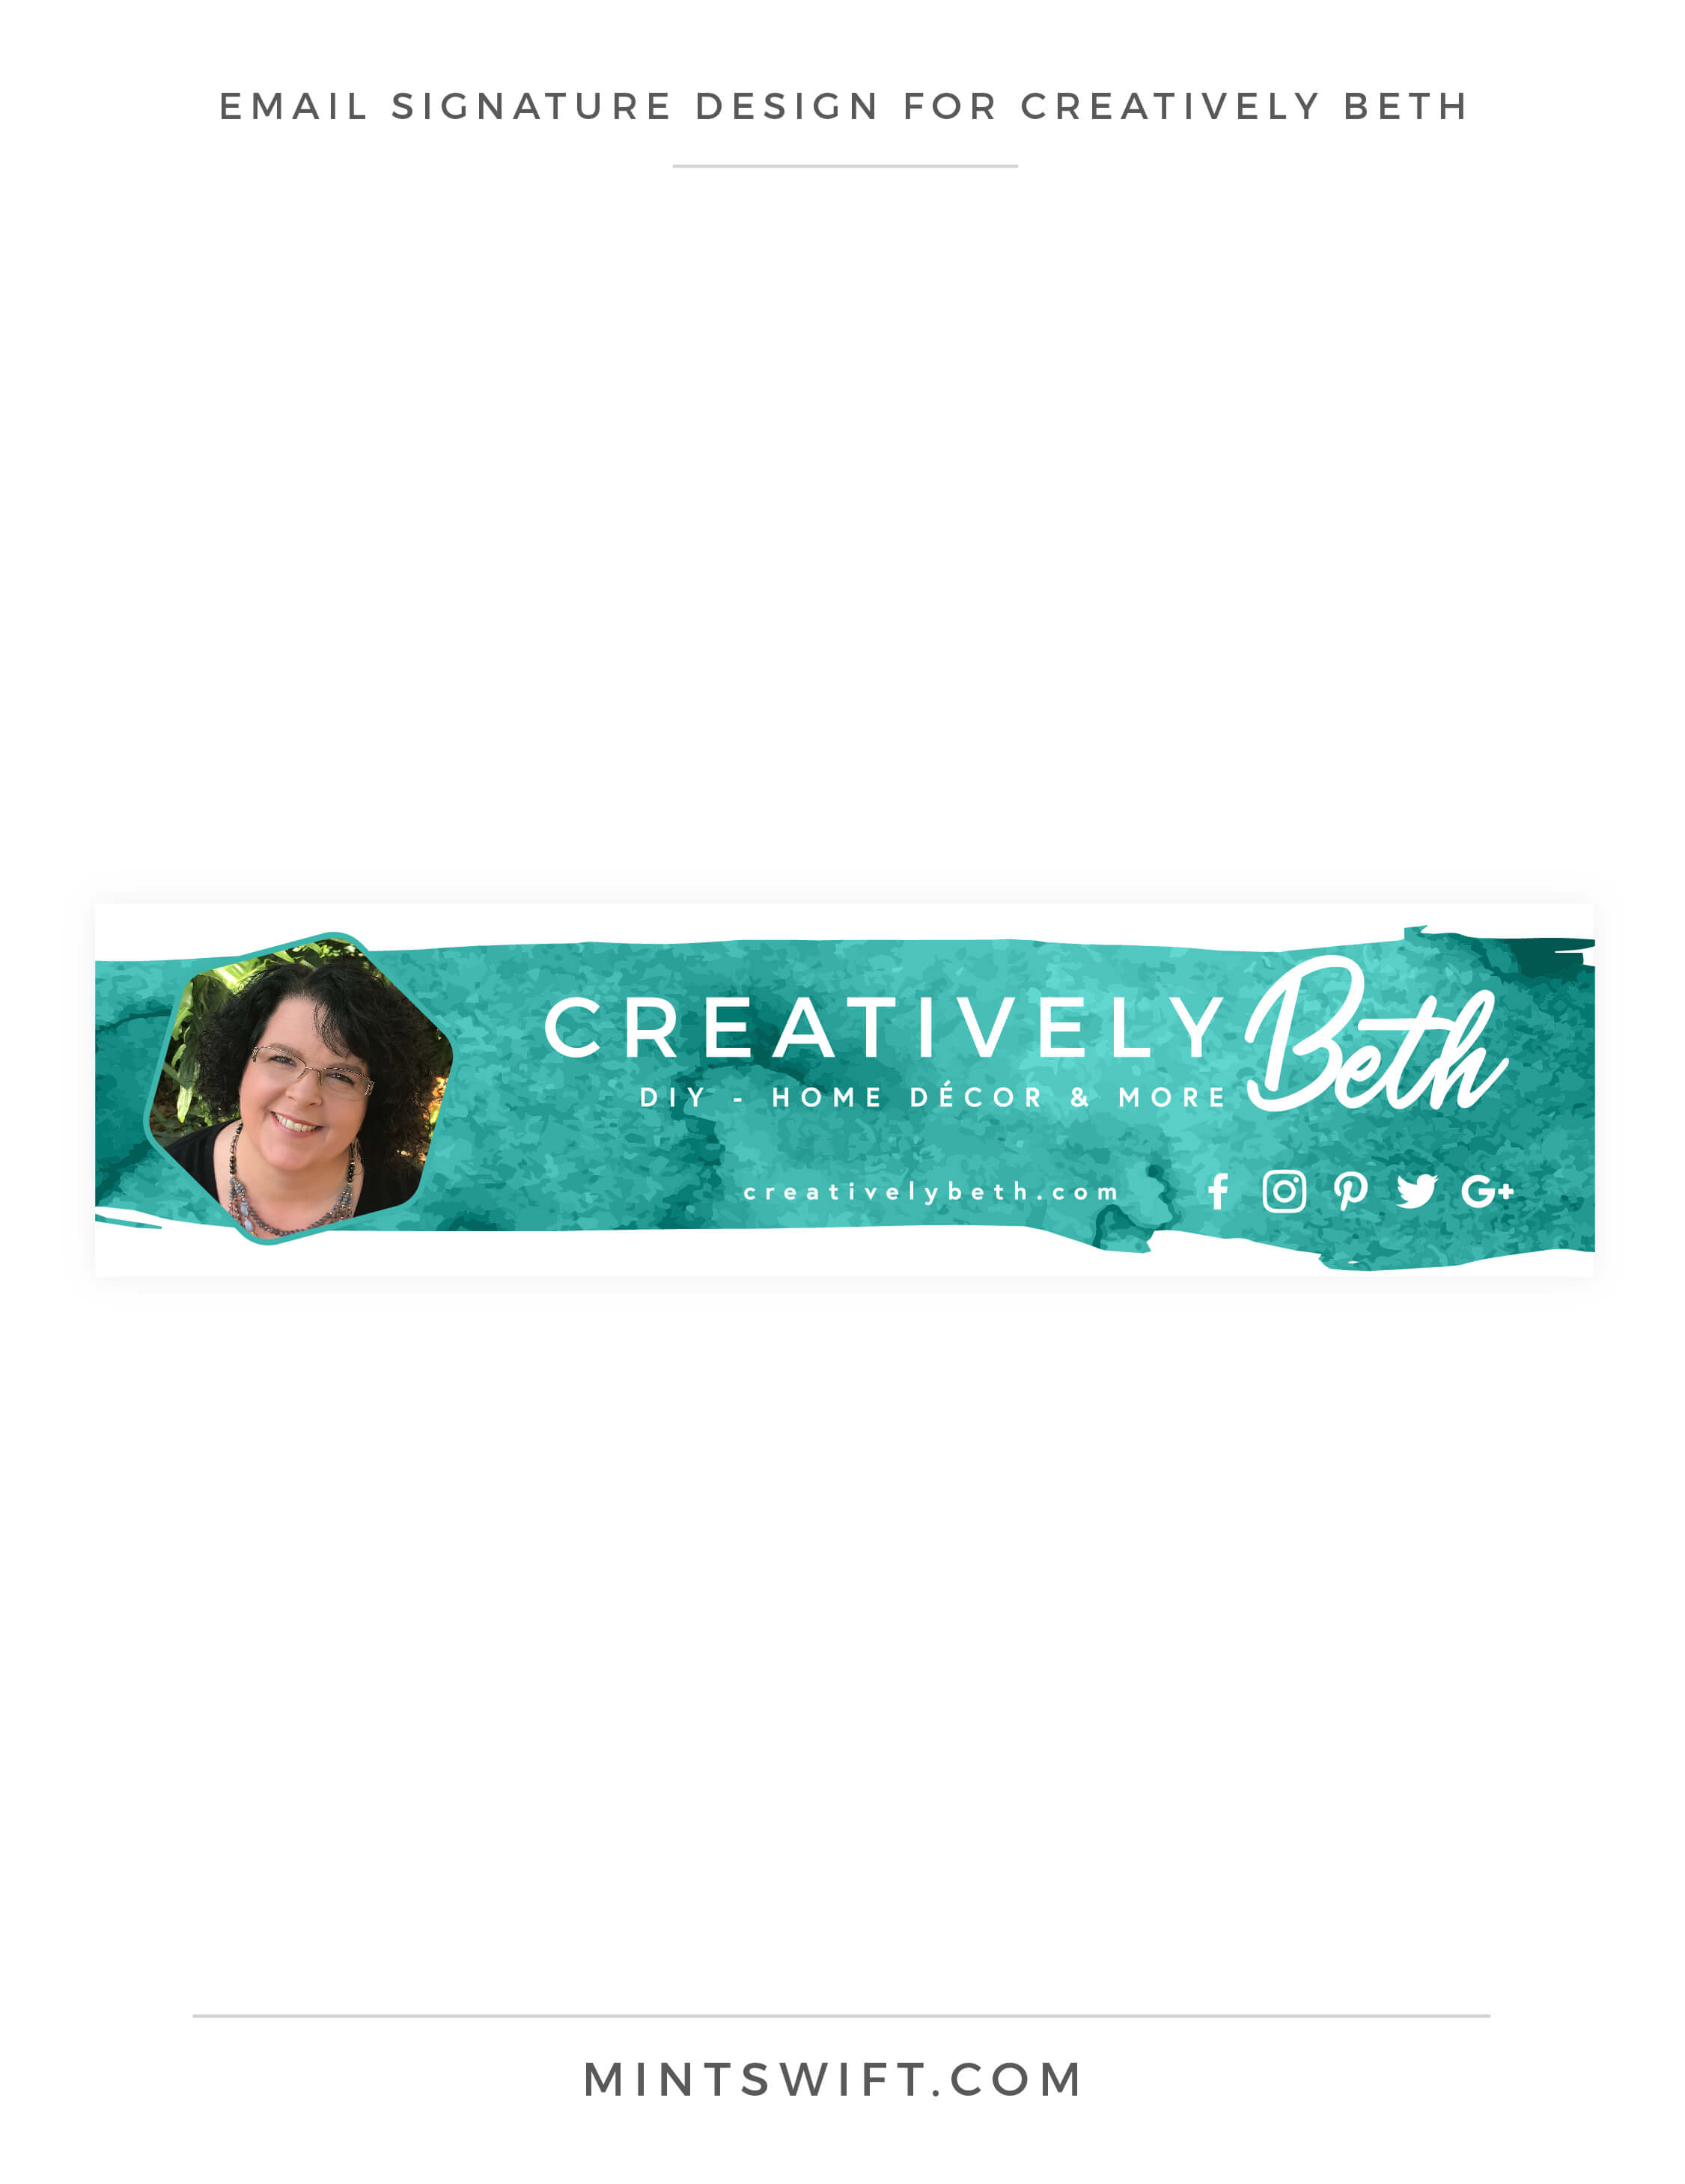 Creatively Beth - Email signature design - Brand & Website Design - MintSwift